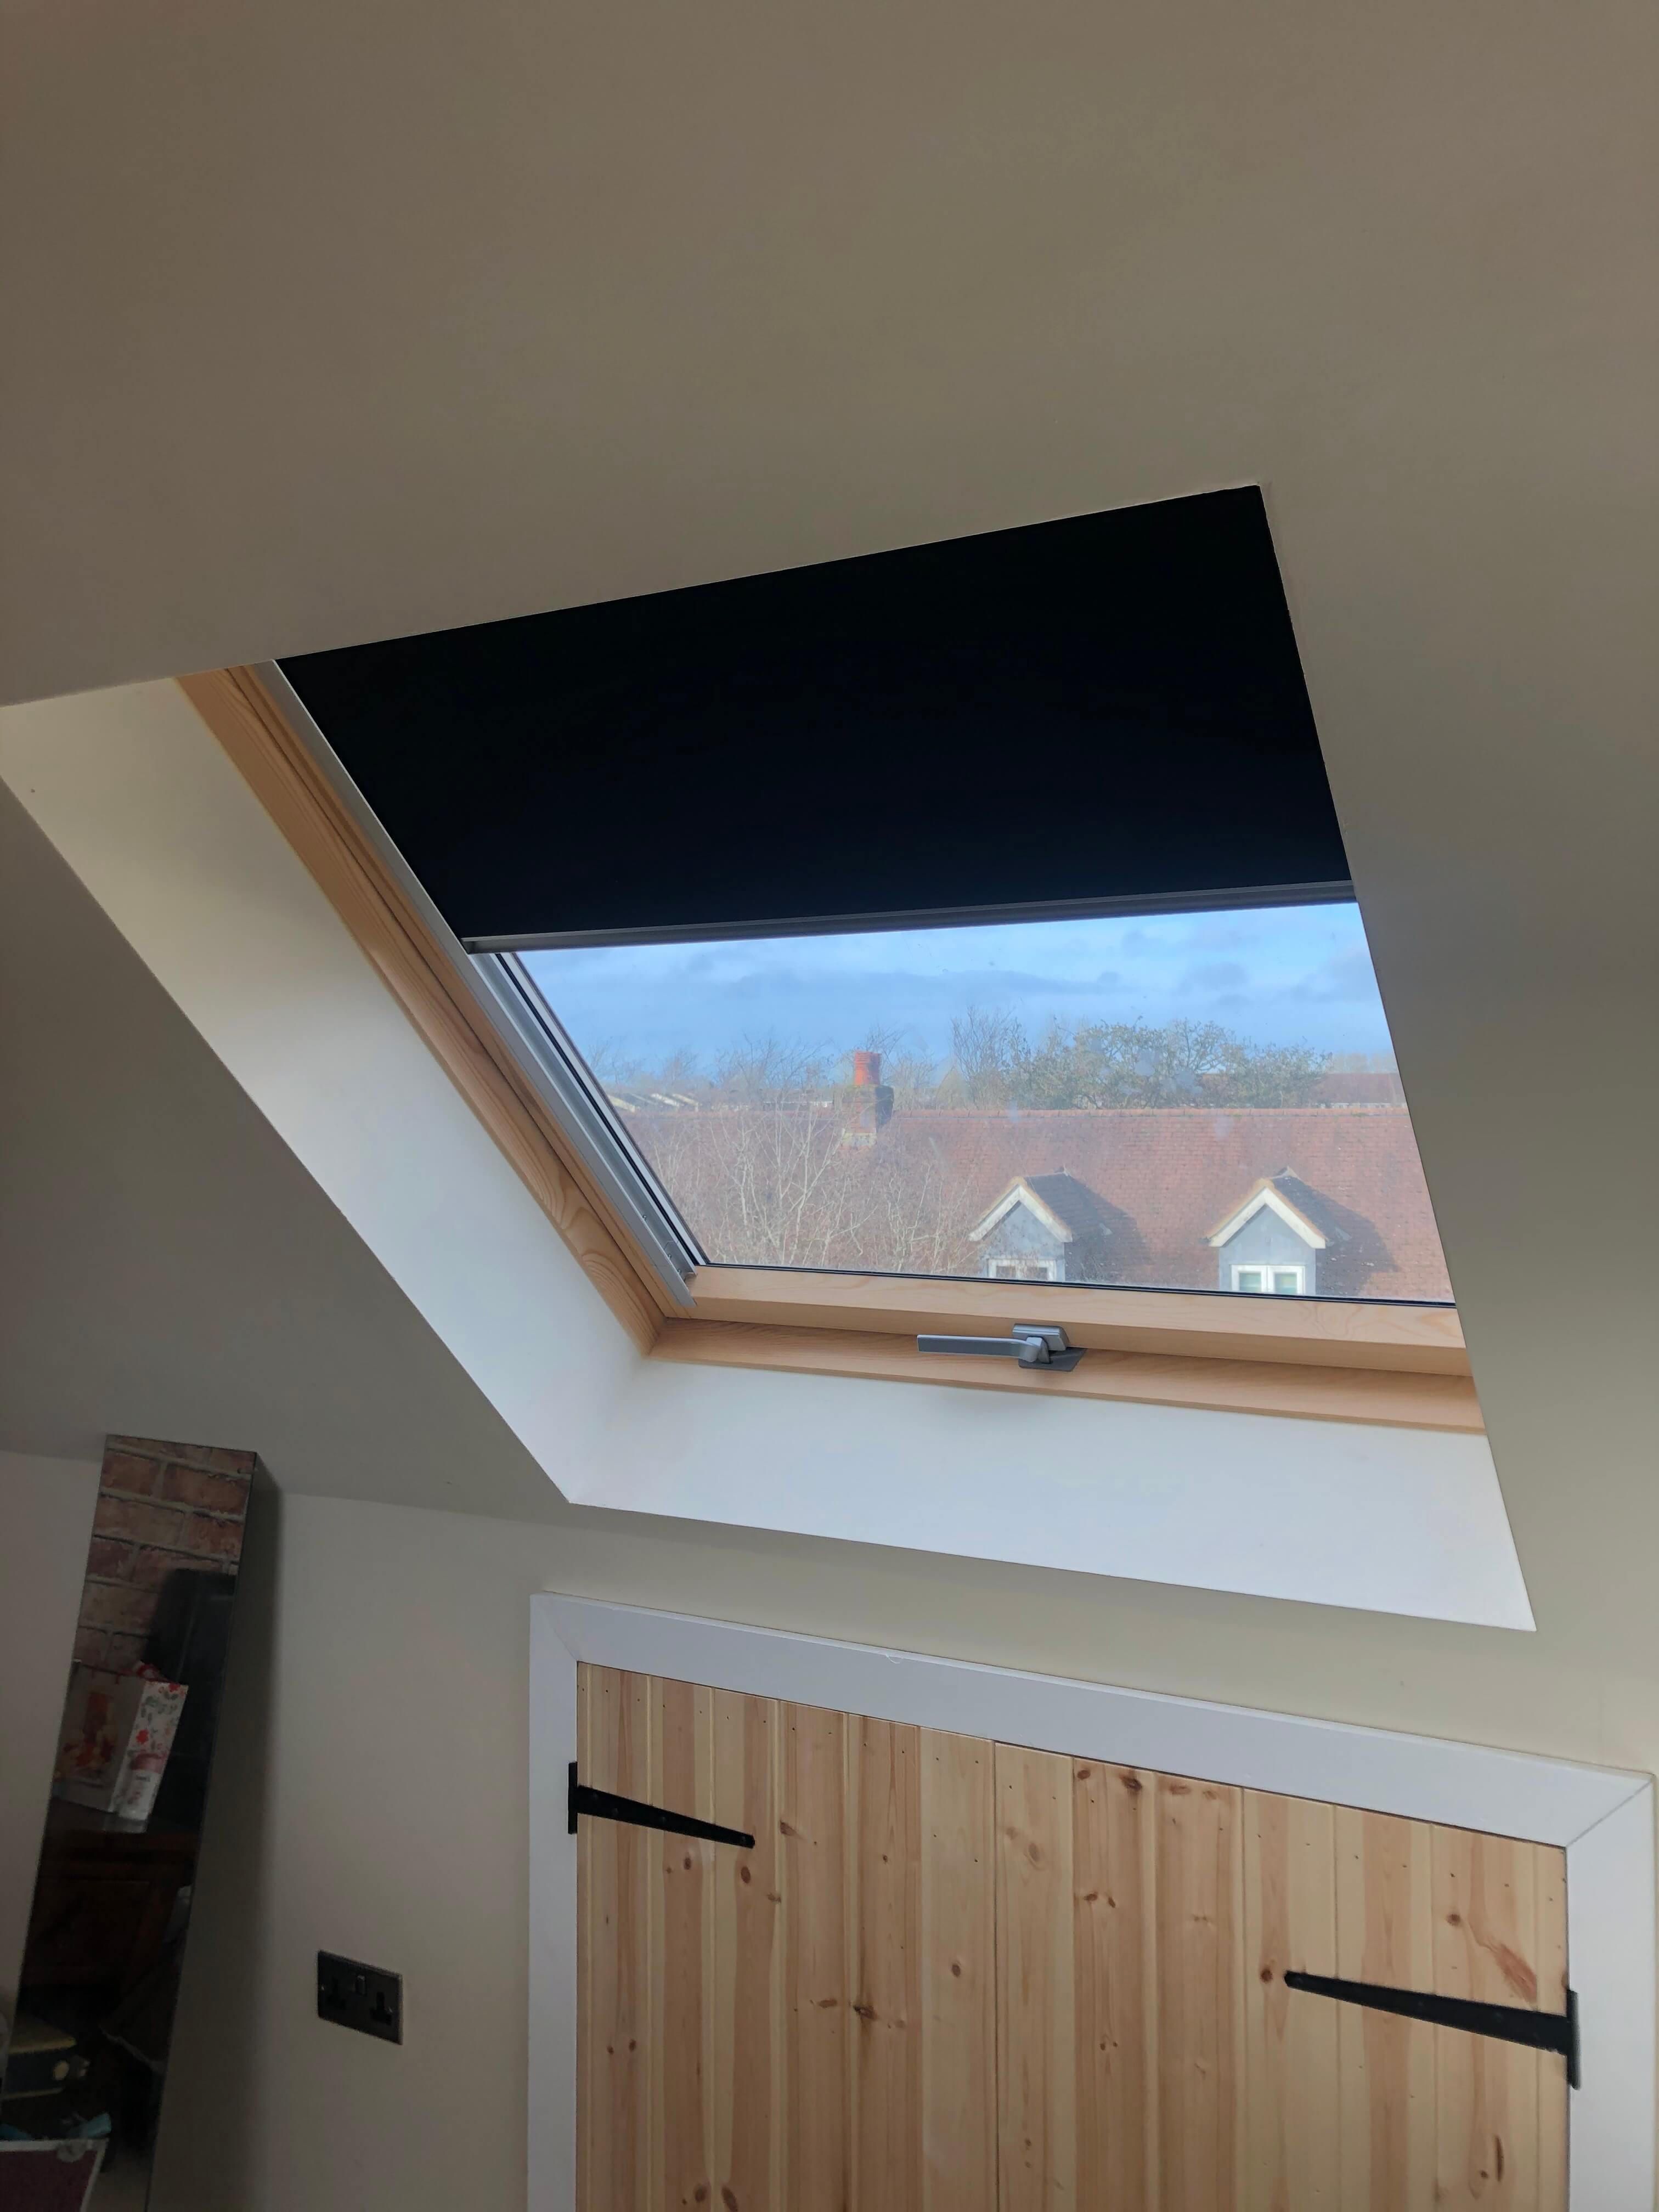 Dakea Ultima™ roof windows in the classic wooden finish